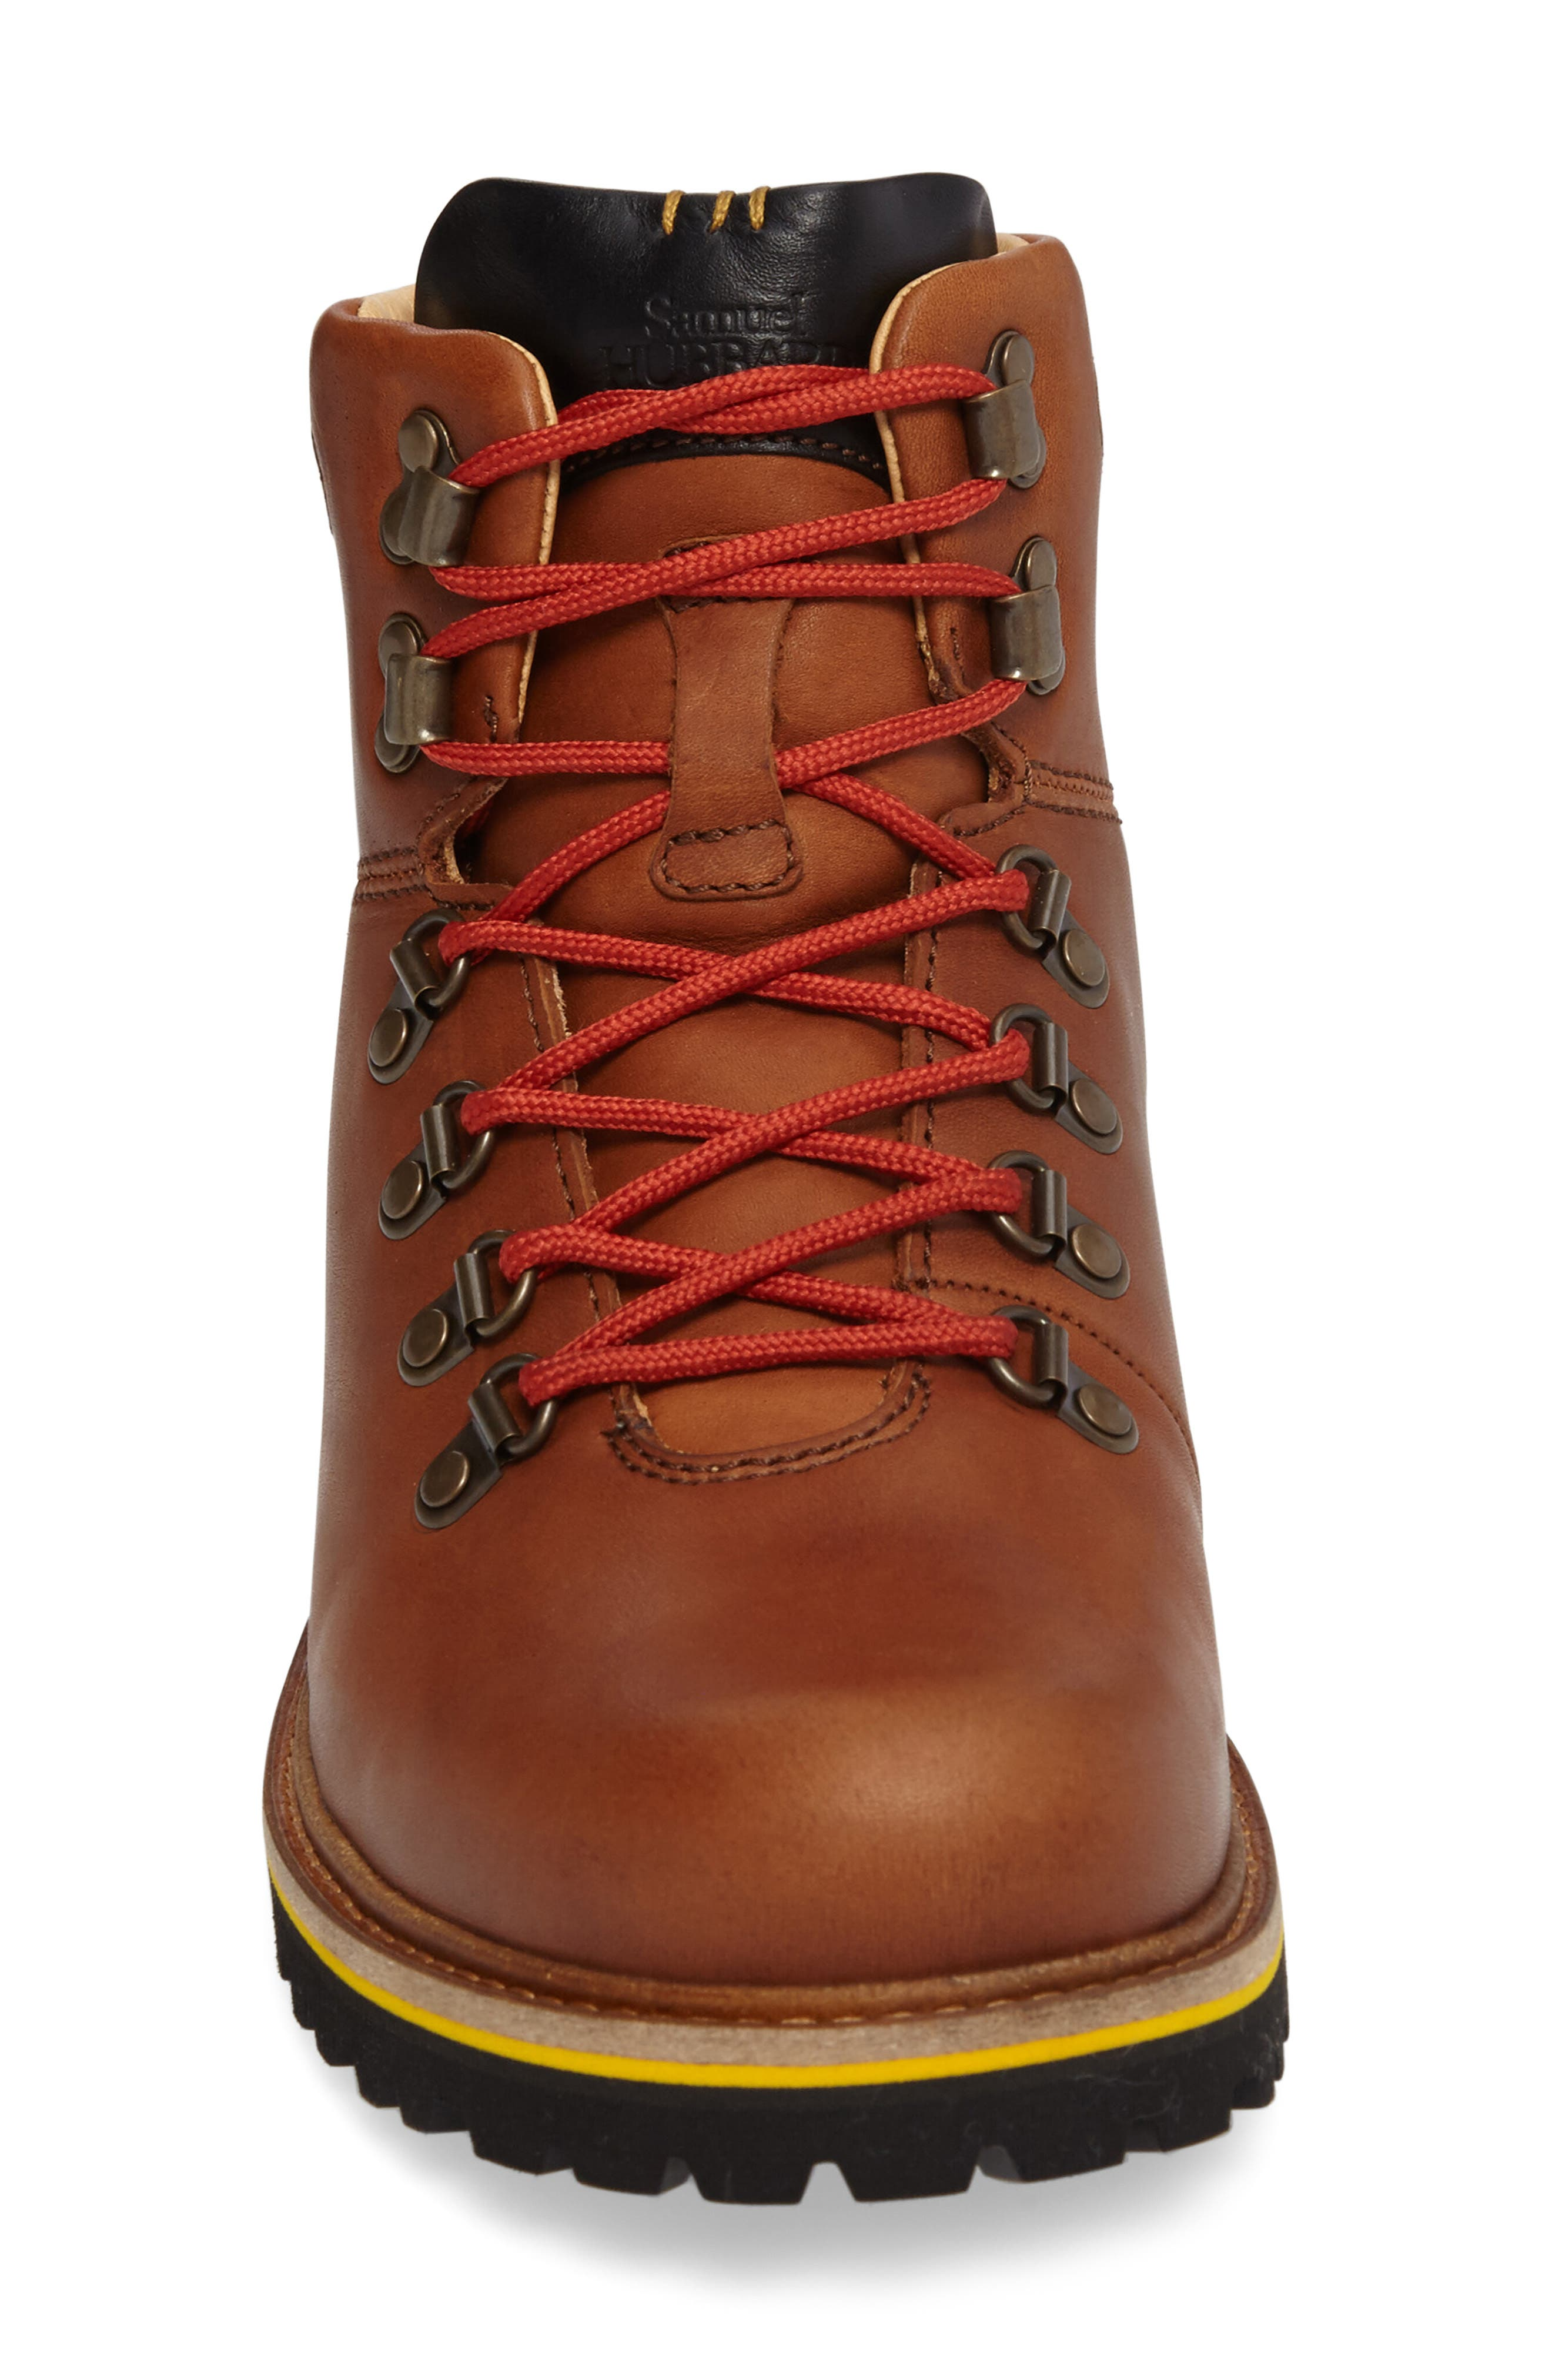 Mt. Tam Hiking Boot,                             Alternate thumbnail 3, color,                             Saddlebag Tan Leather